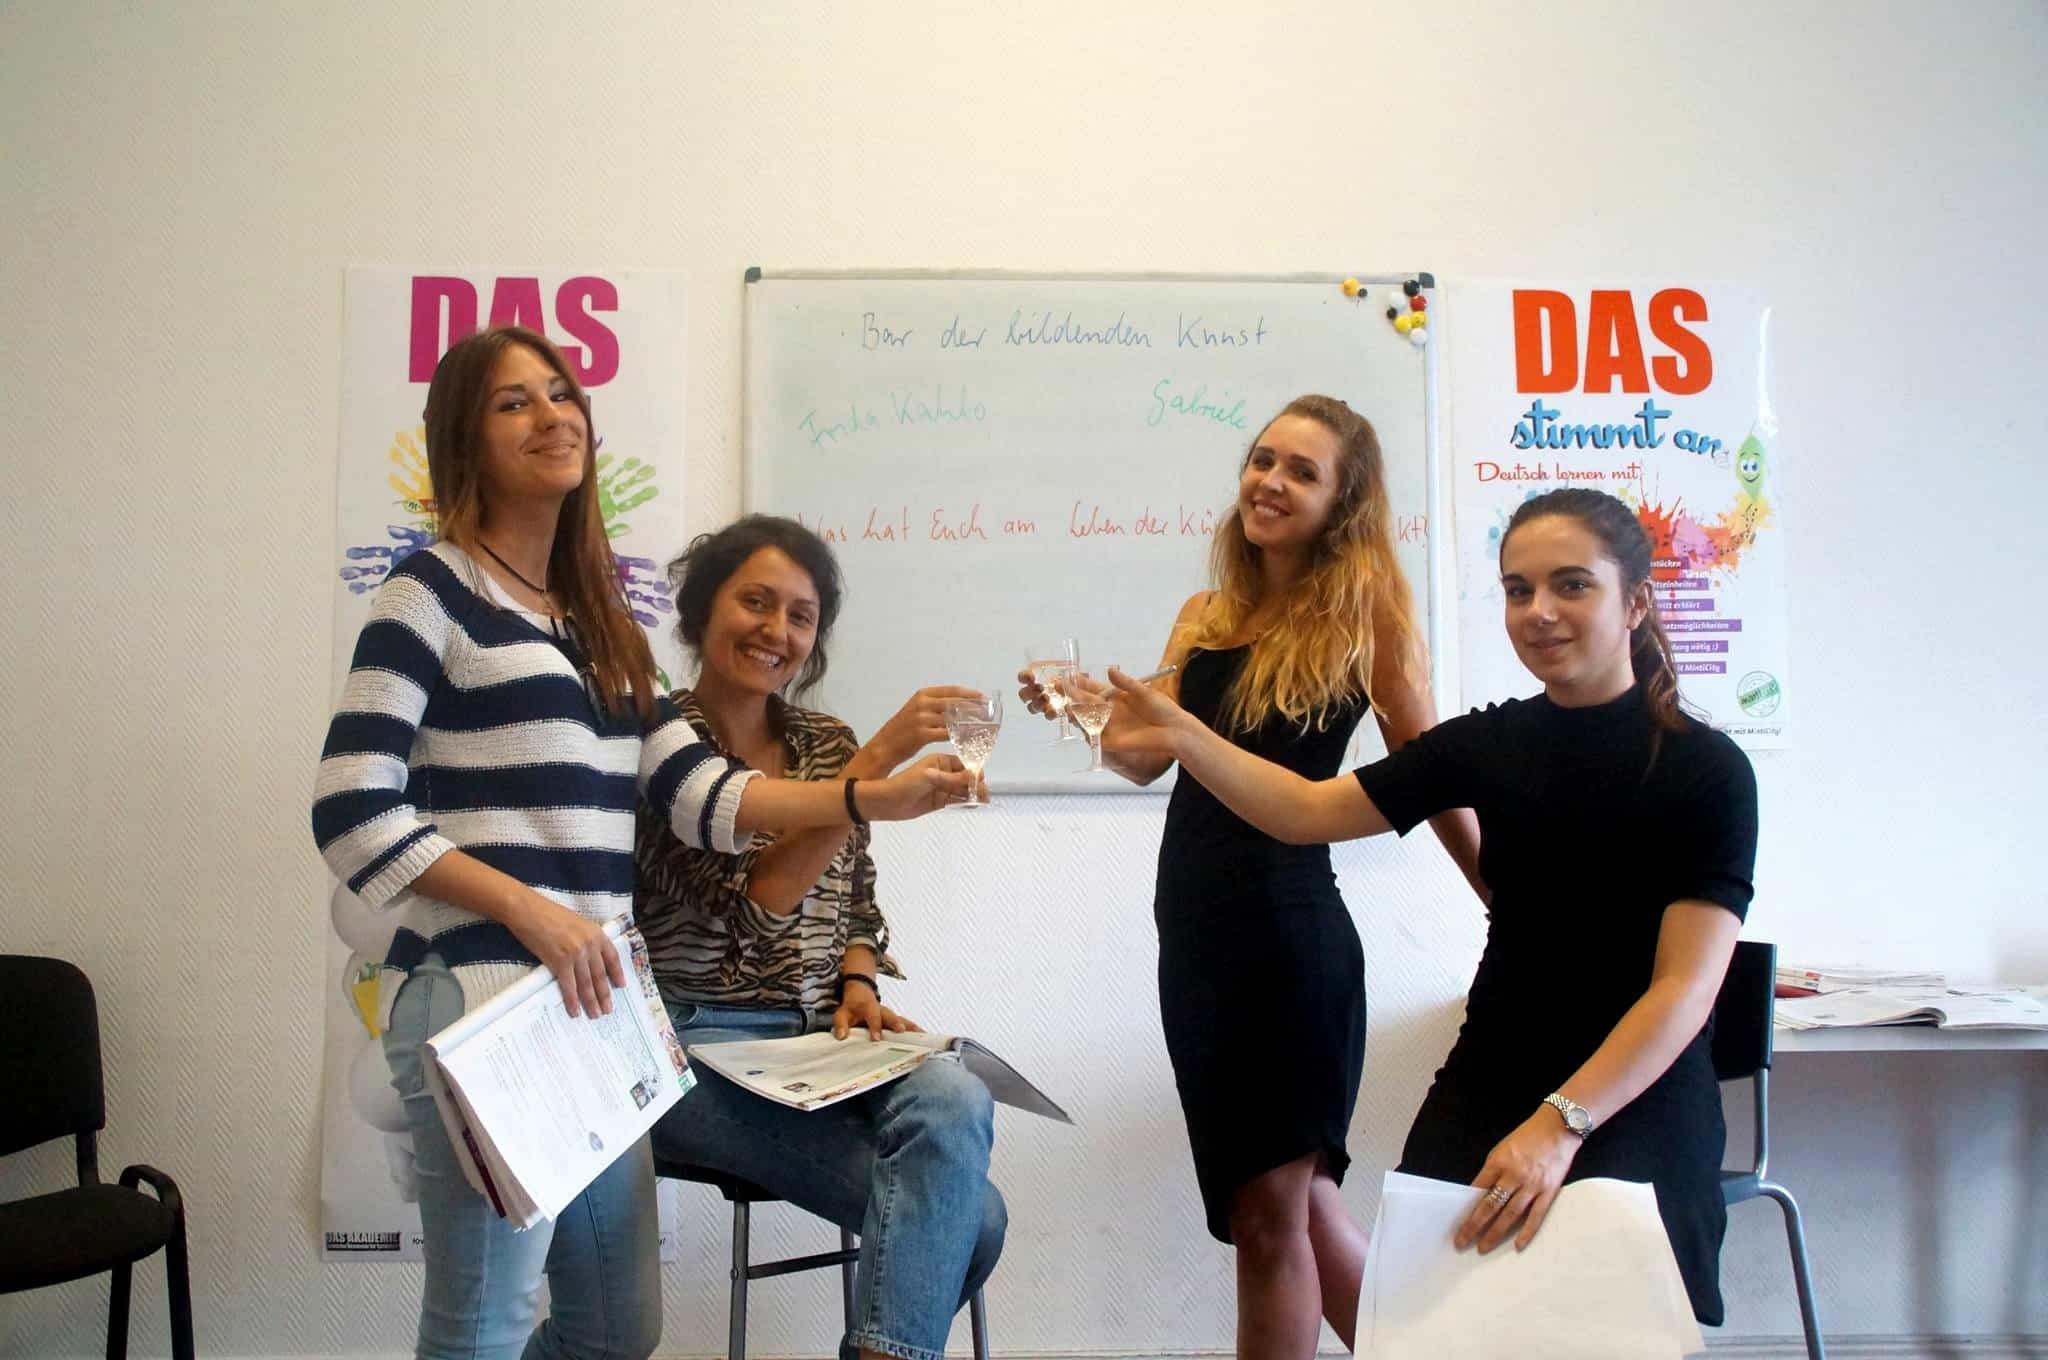 A1 German Course